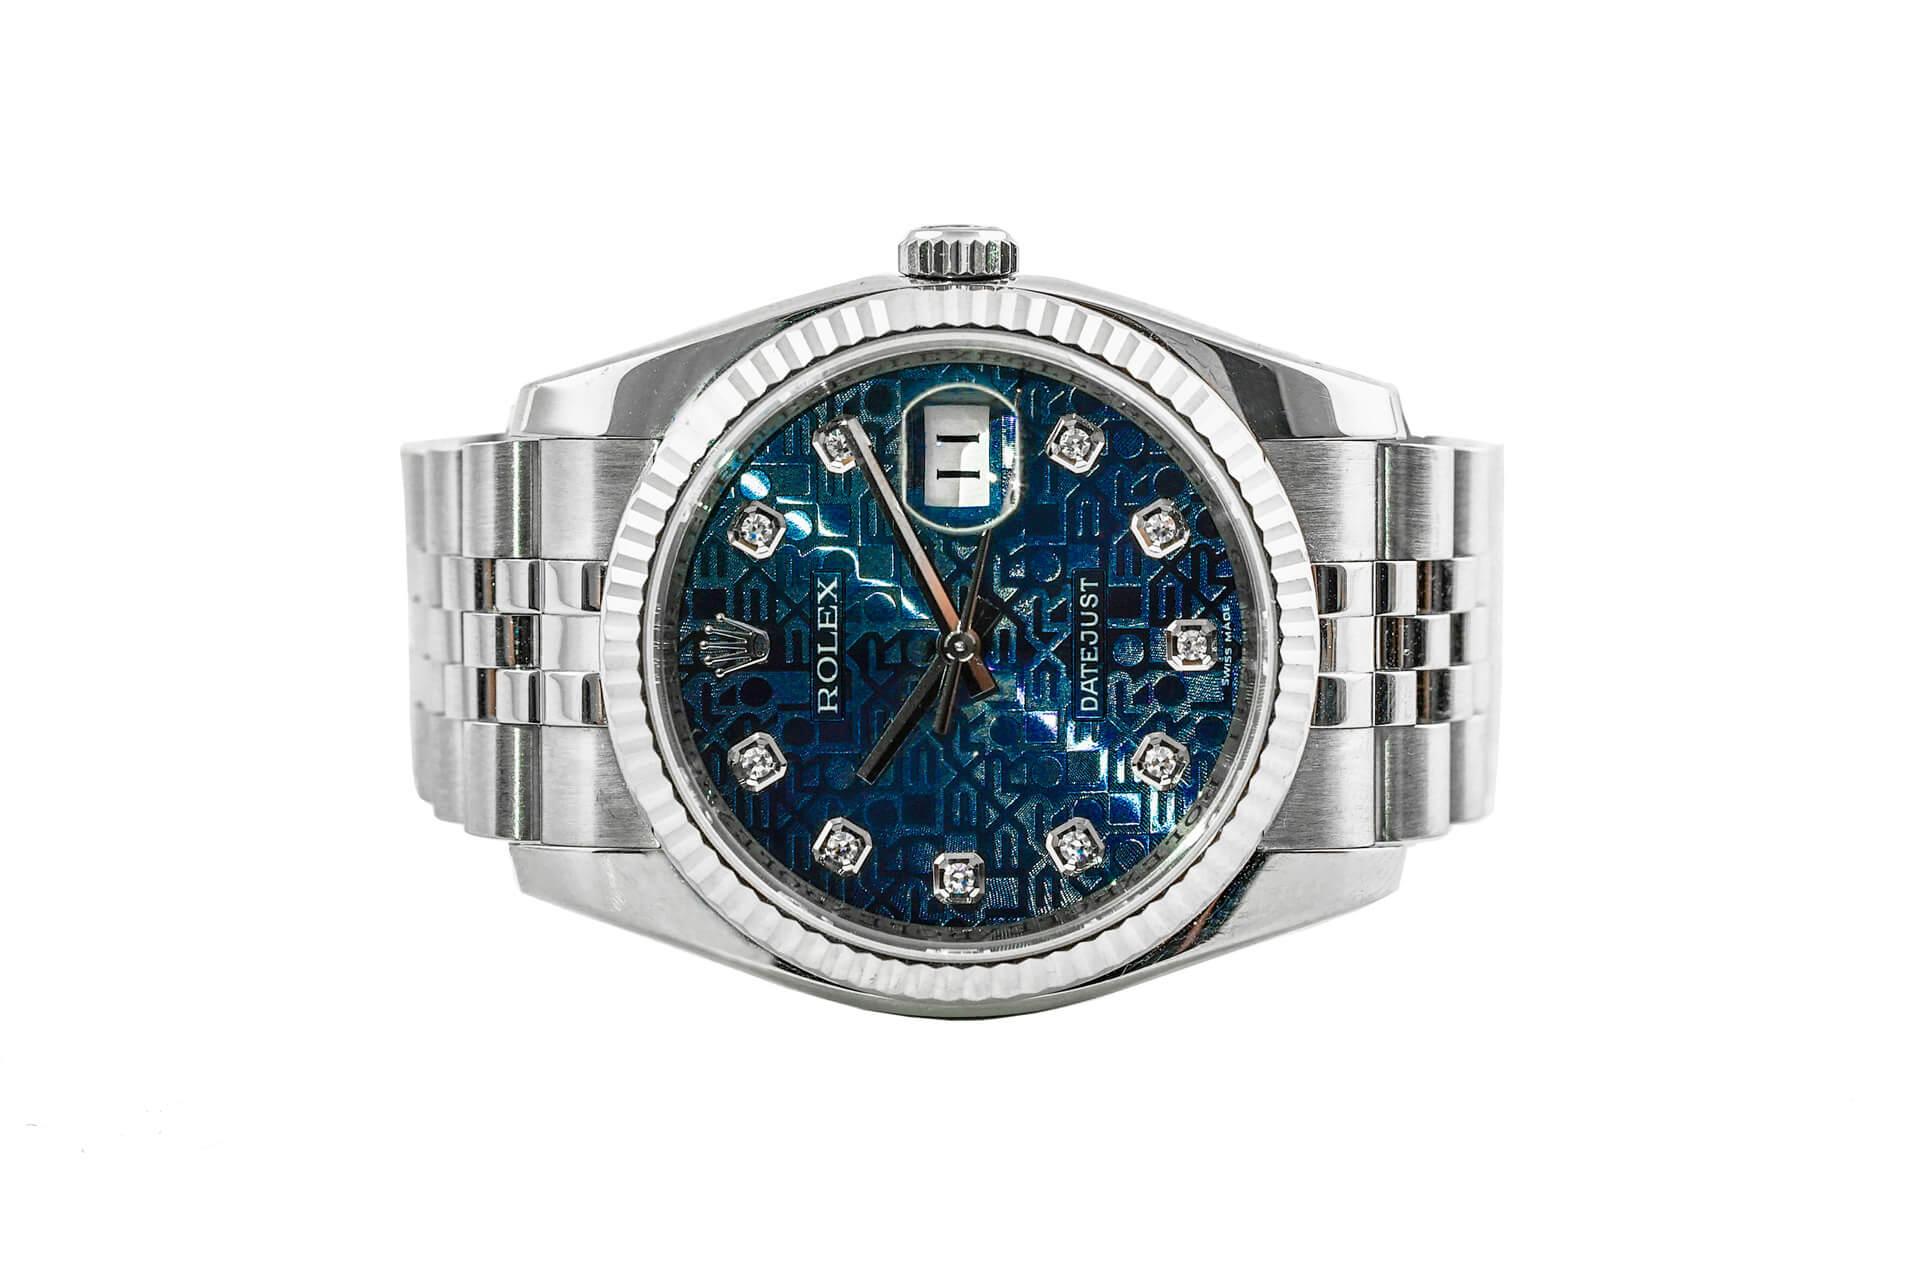 Review đồng hồ Rolex Datejust mặt xanh vi tính